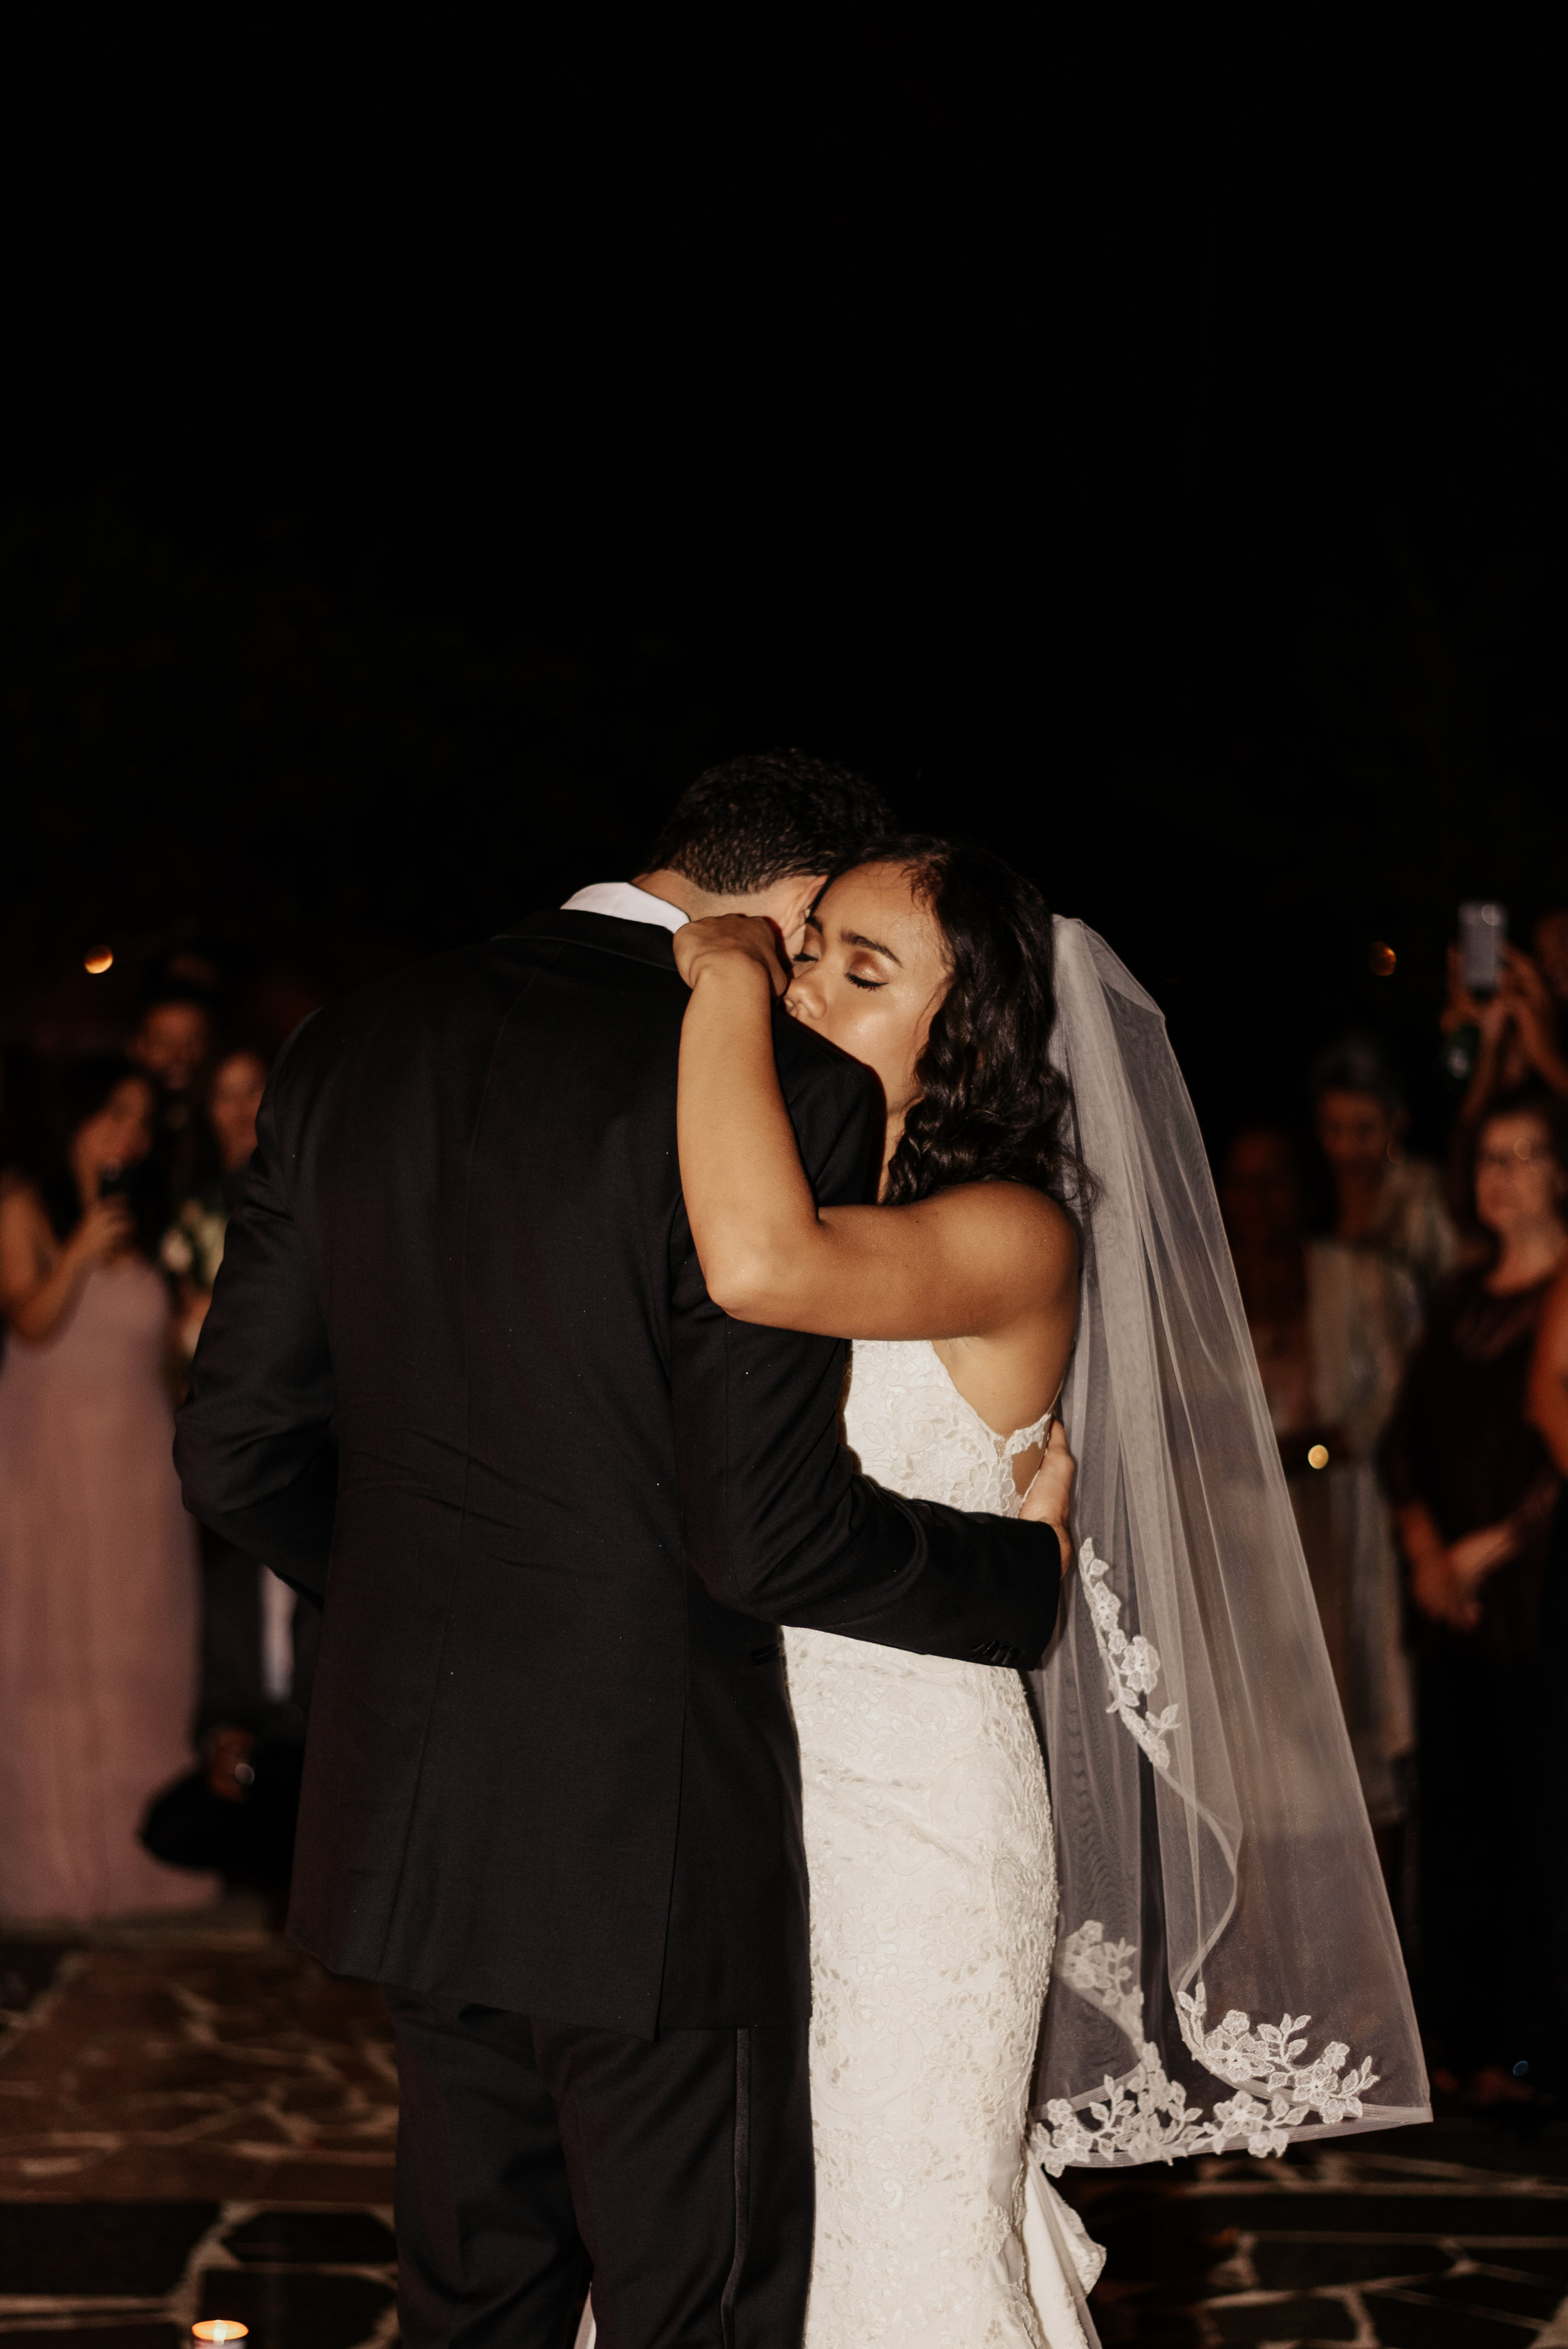 Kirstie-AJ-Wedding-9209.jpg